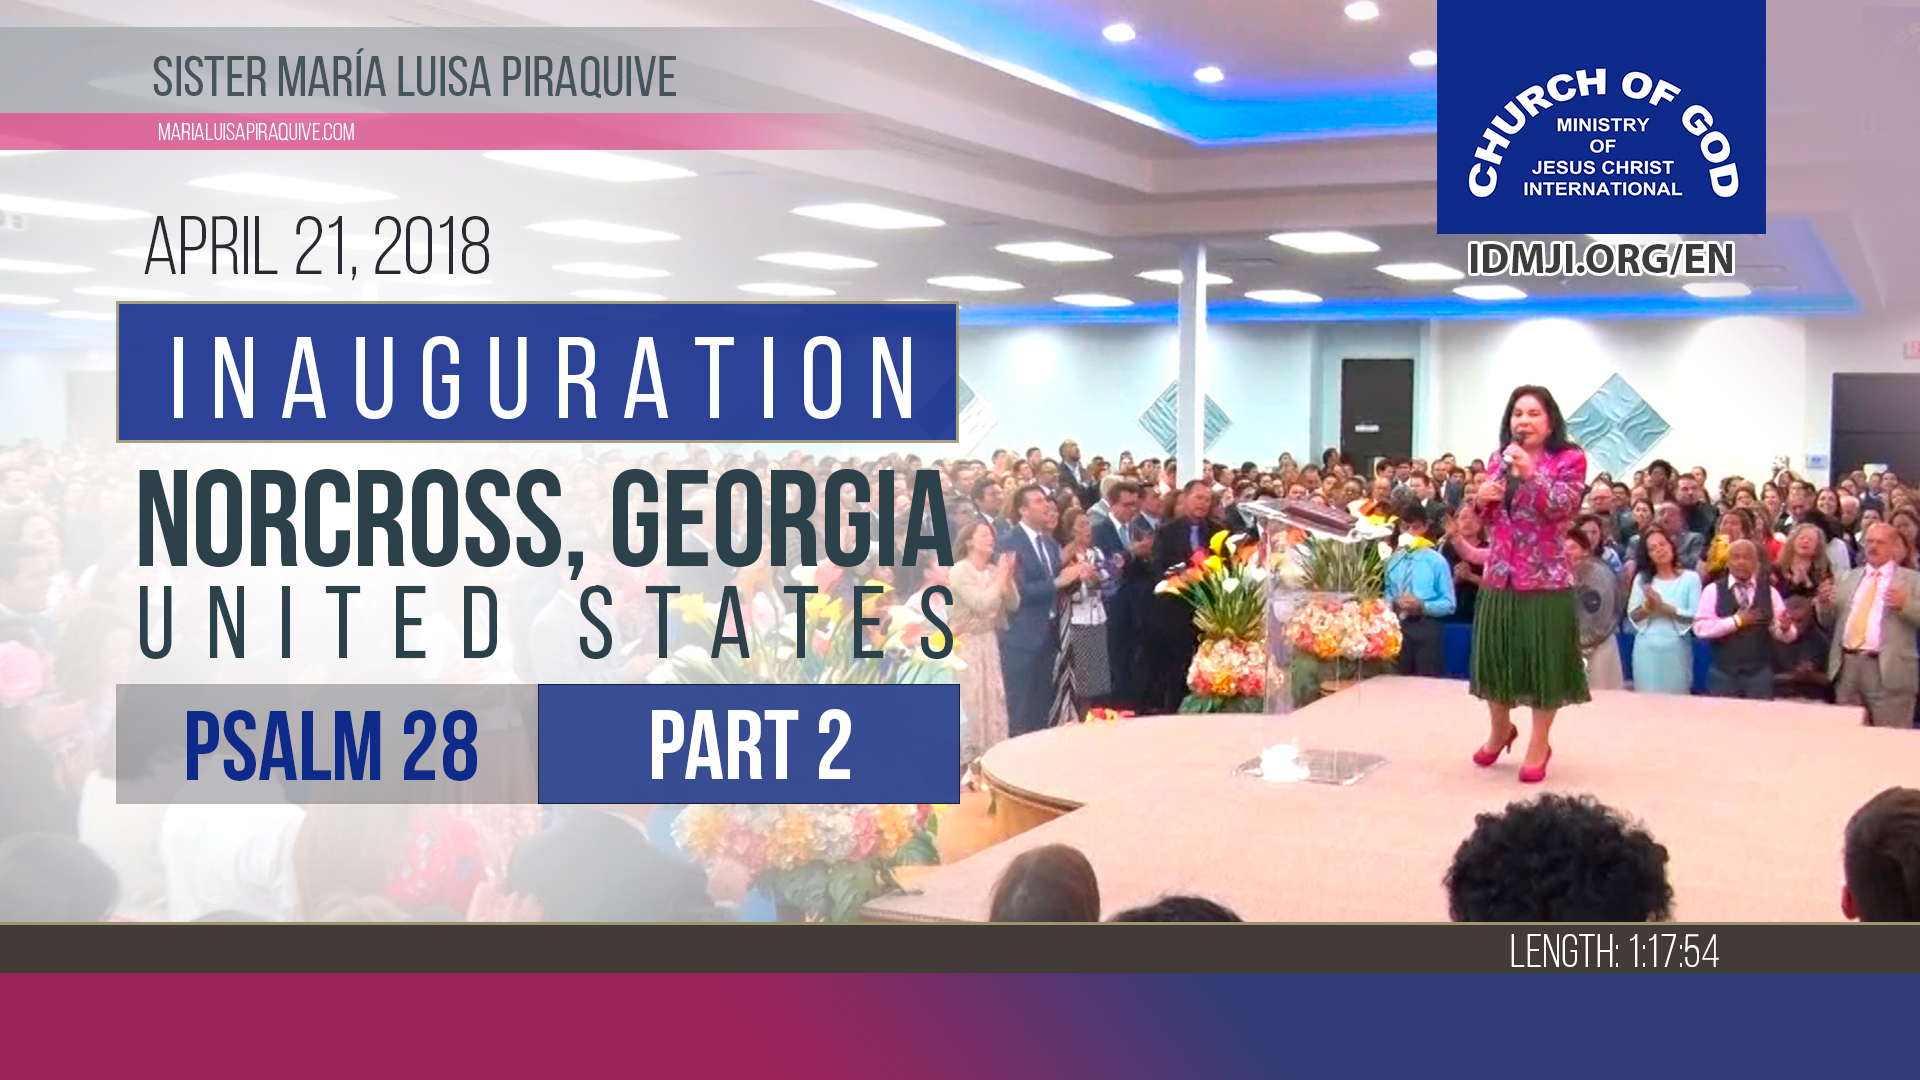 Inauguration Norcross, Georgia, United States (Part 2)